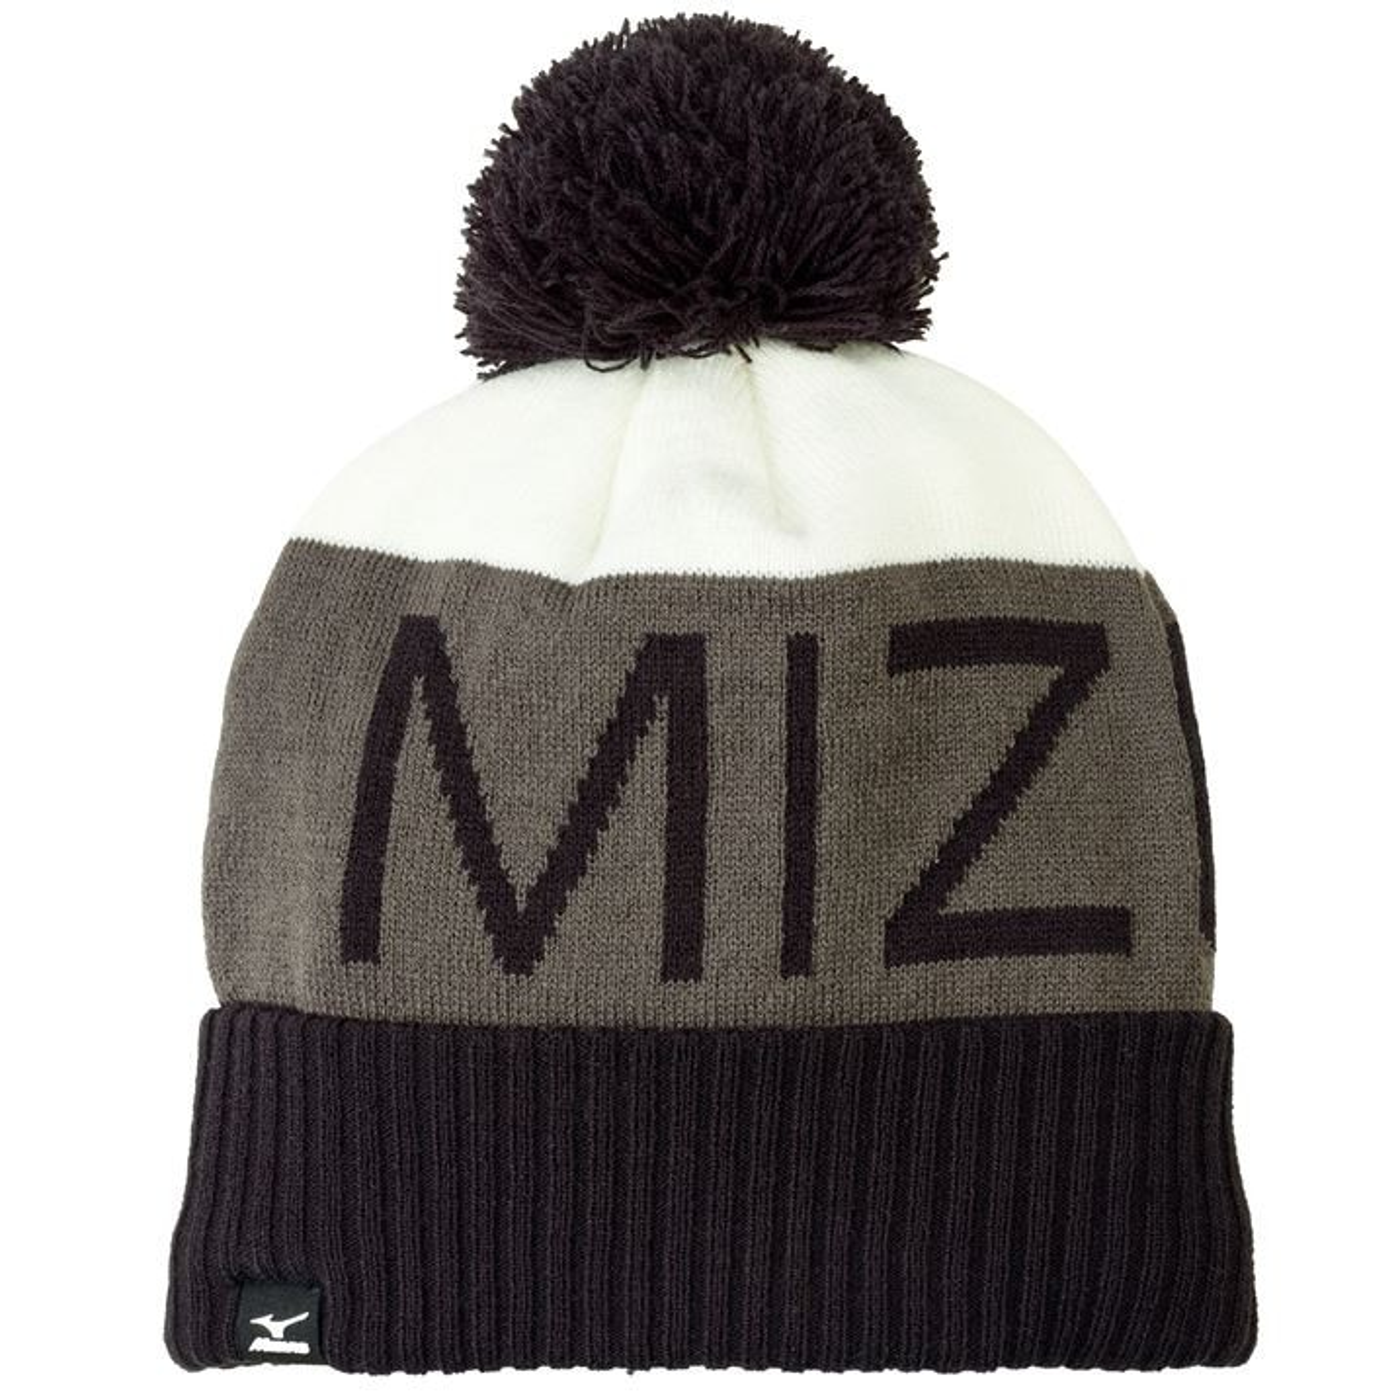 Mizuno Bobble Hat Sn 71